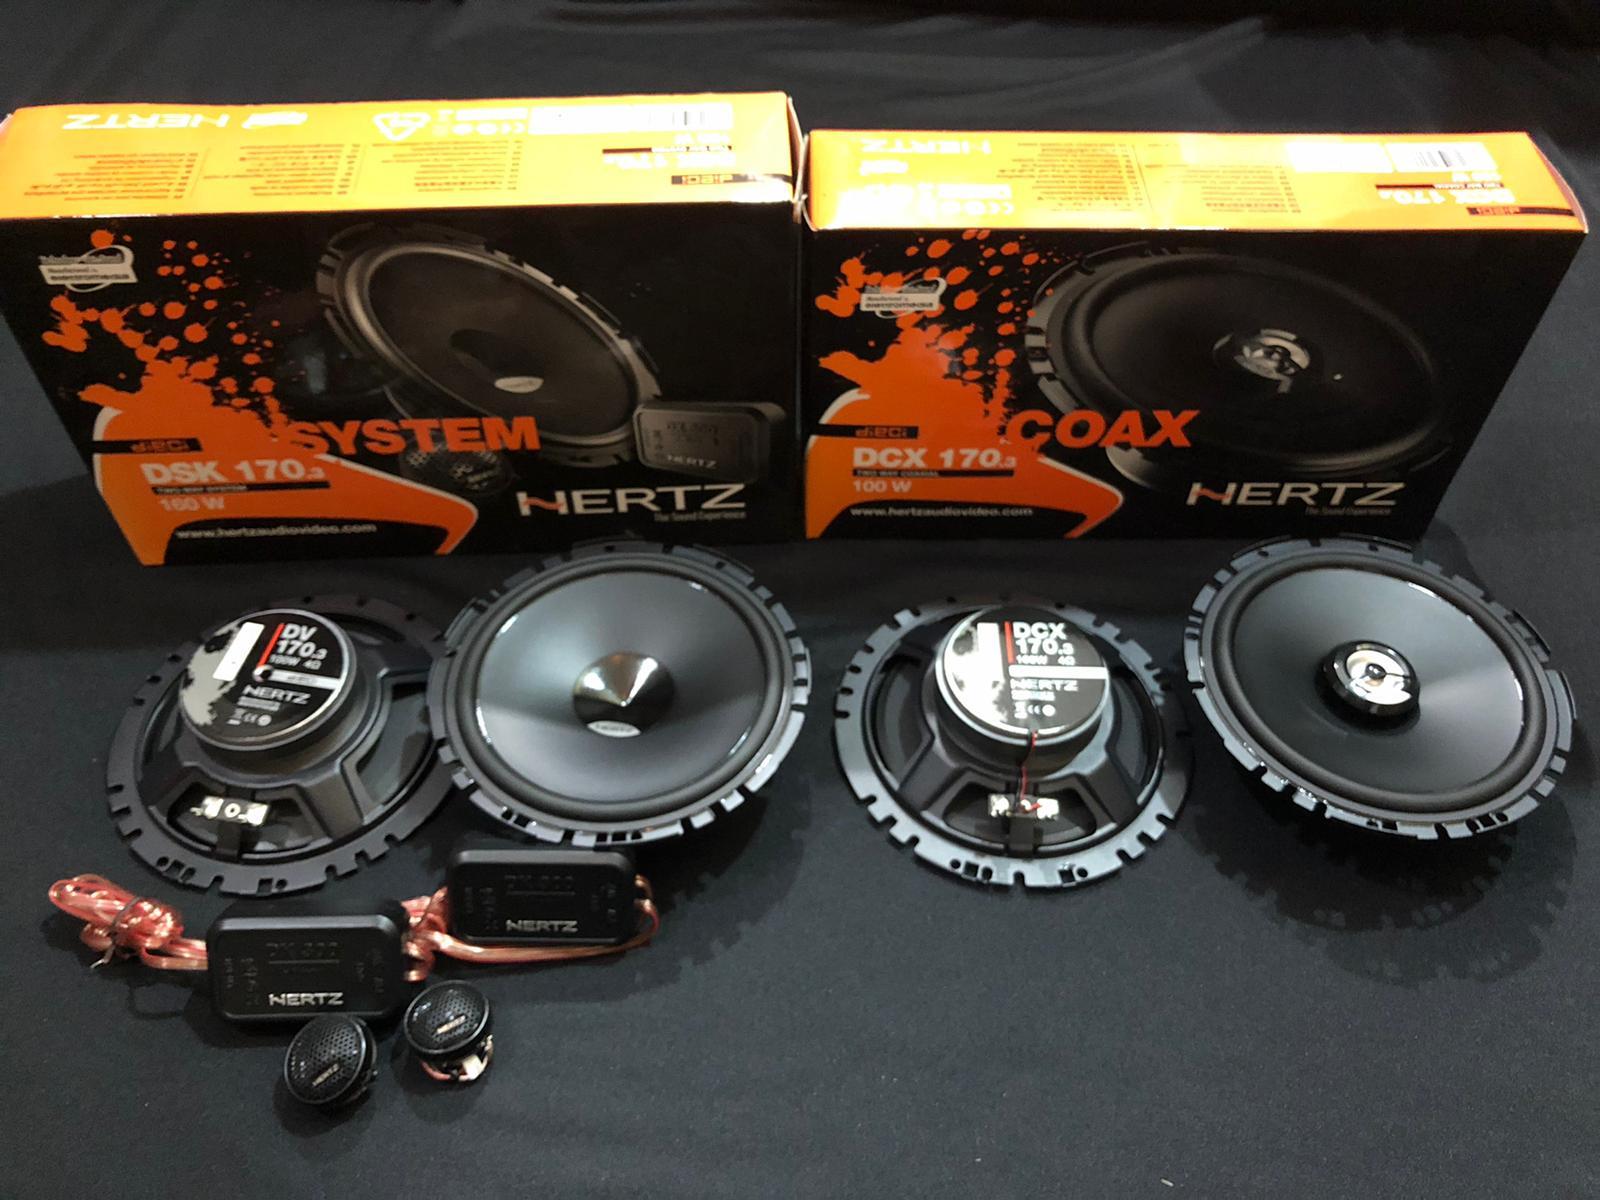 Hertz DSK & DCX 170.3 Coaxial Speakers (Package A)